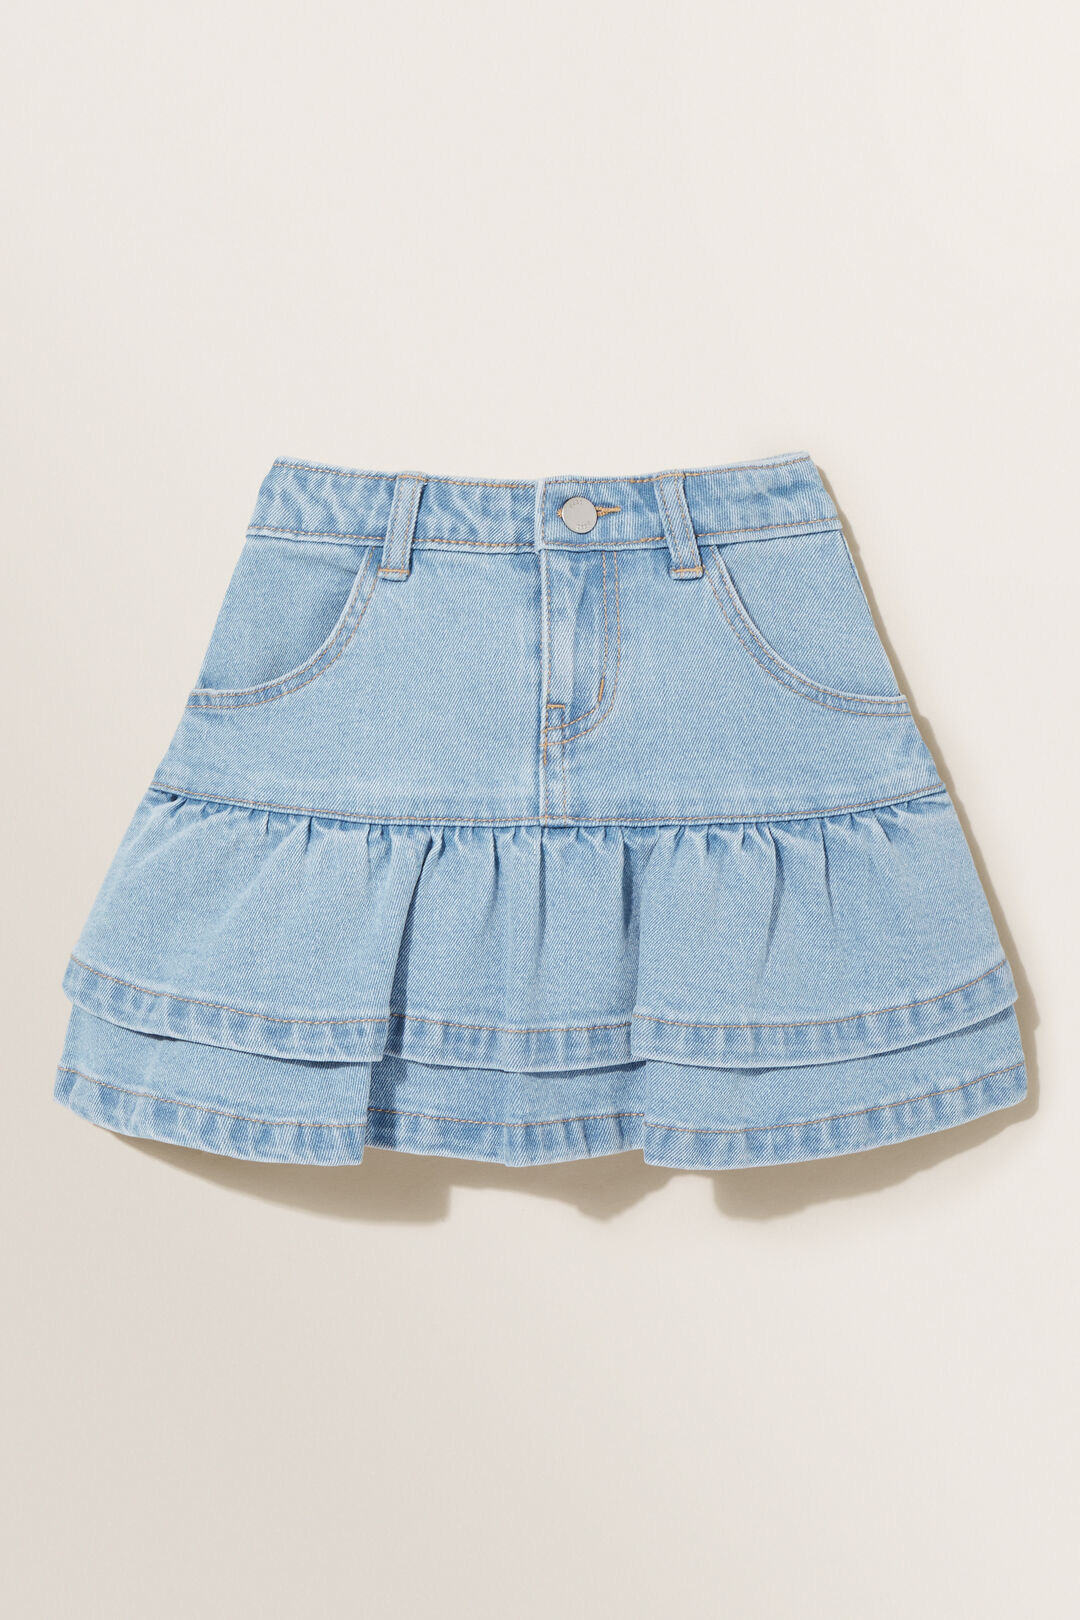 Denim Frill Skirt  CLASSIC WASH  hi-res